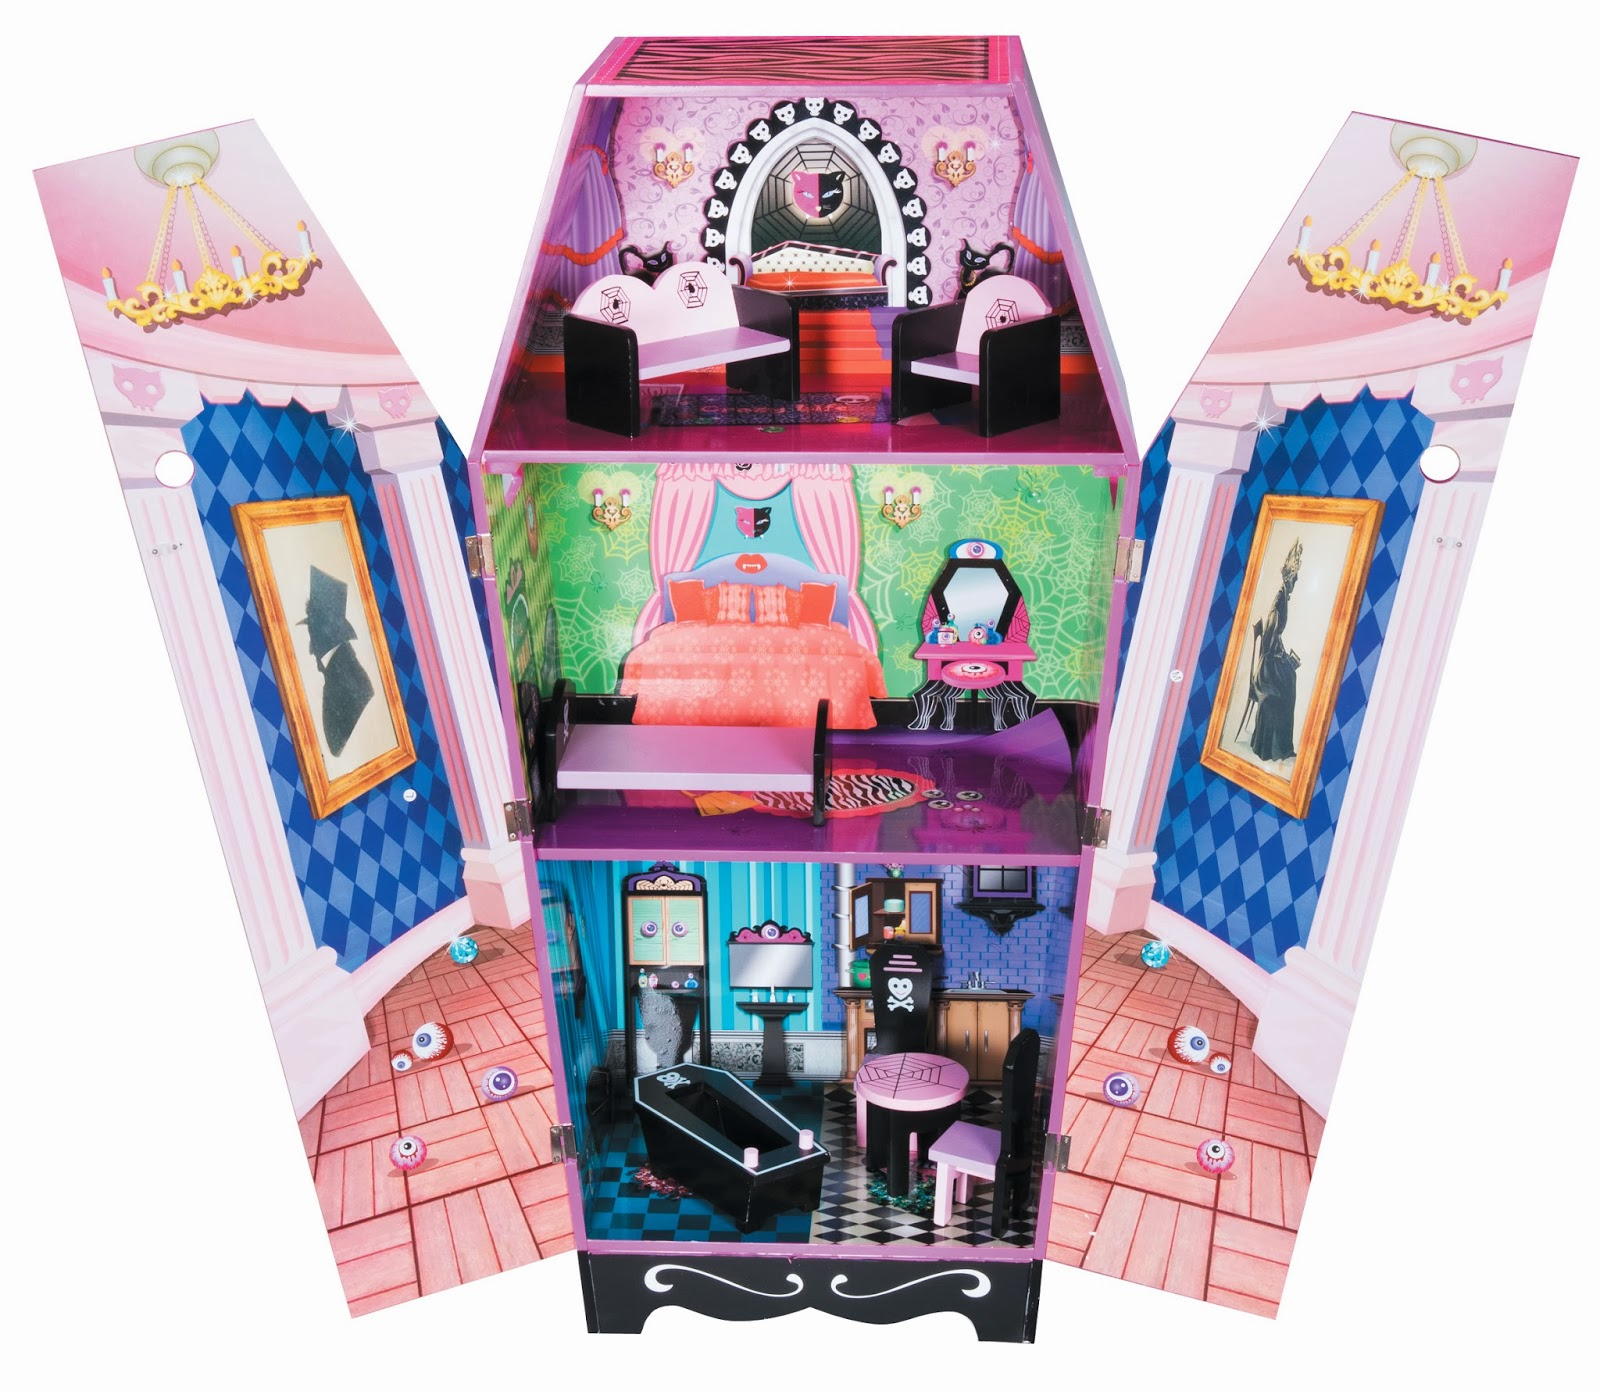 maison hantee jouet club